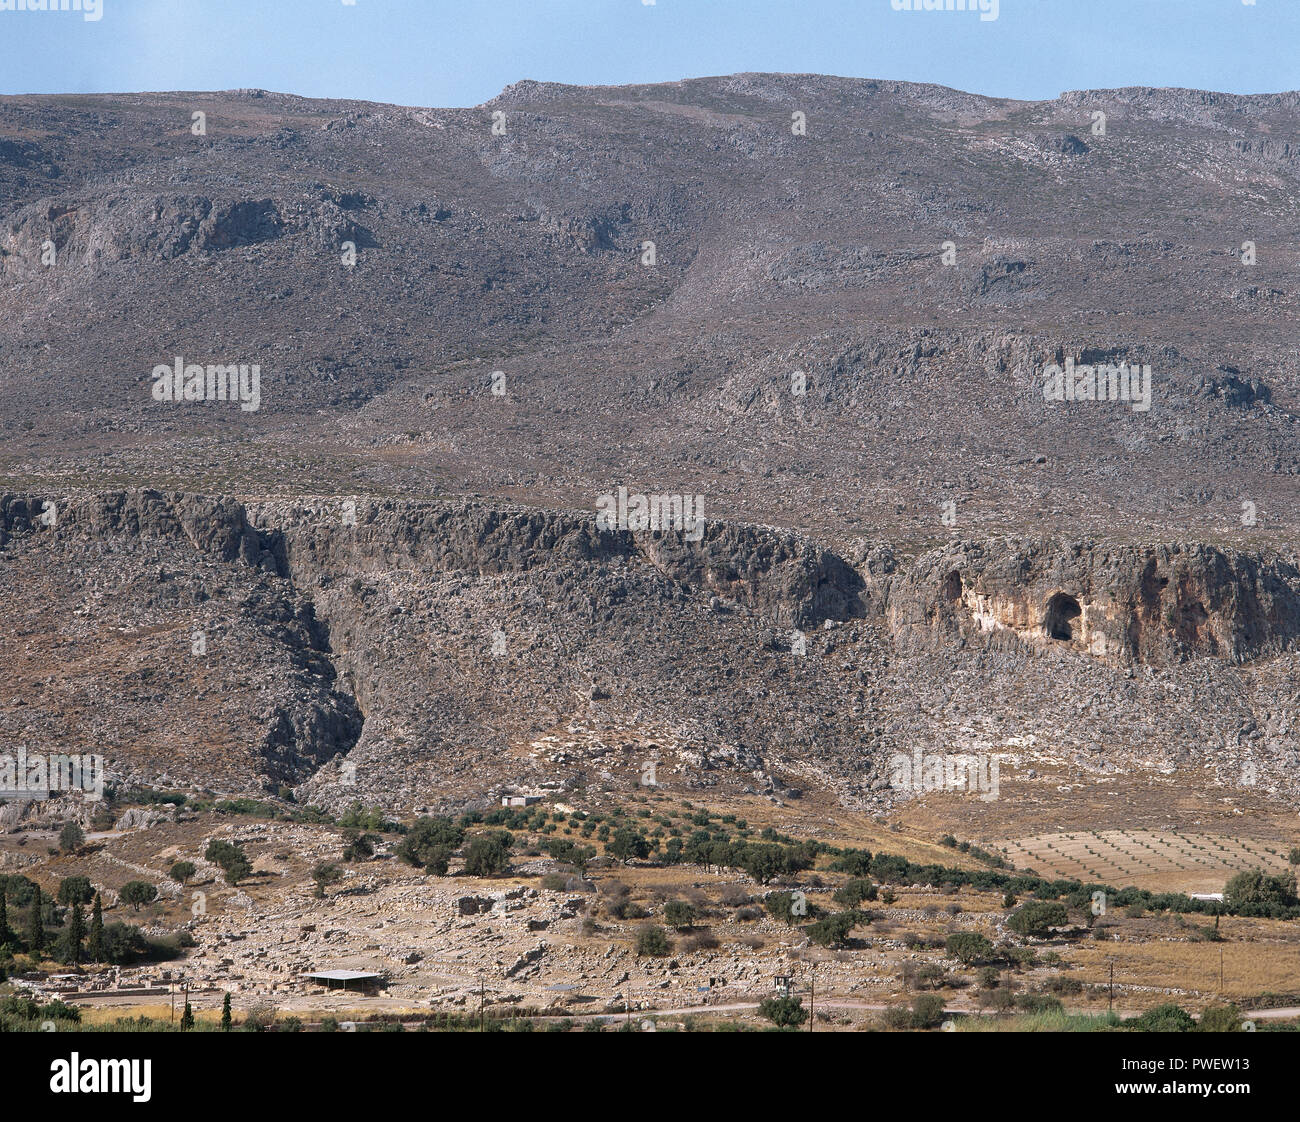 Greece. Kato Zakro. Panoramic view of the Minoan archaeological site. 17th century BC. Island of Crete. - Stock Image